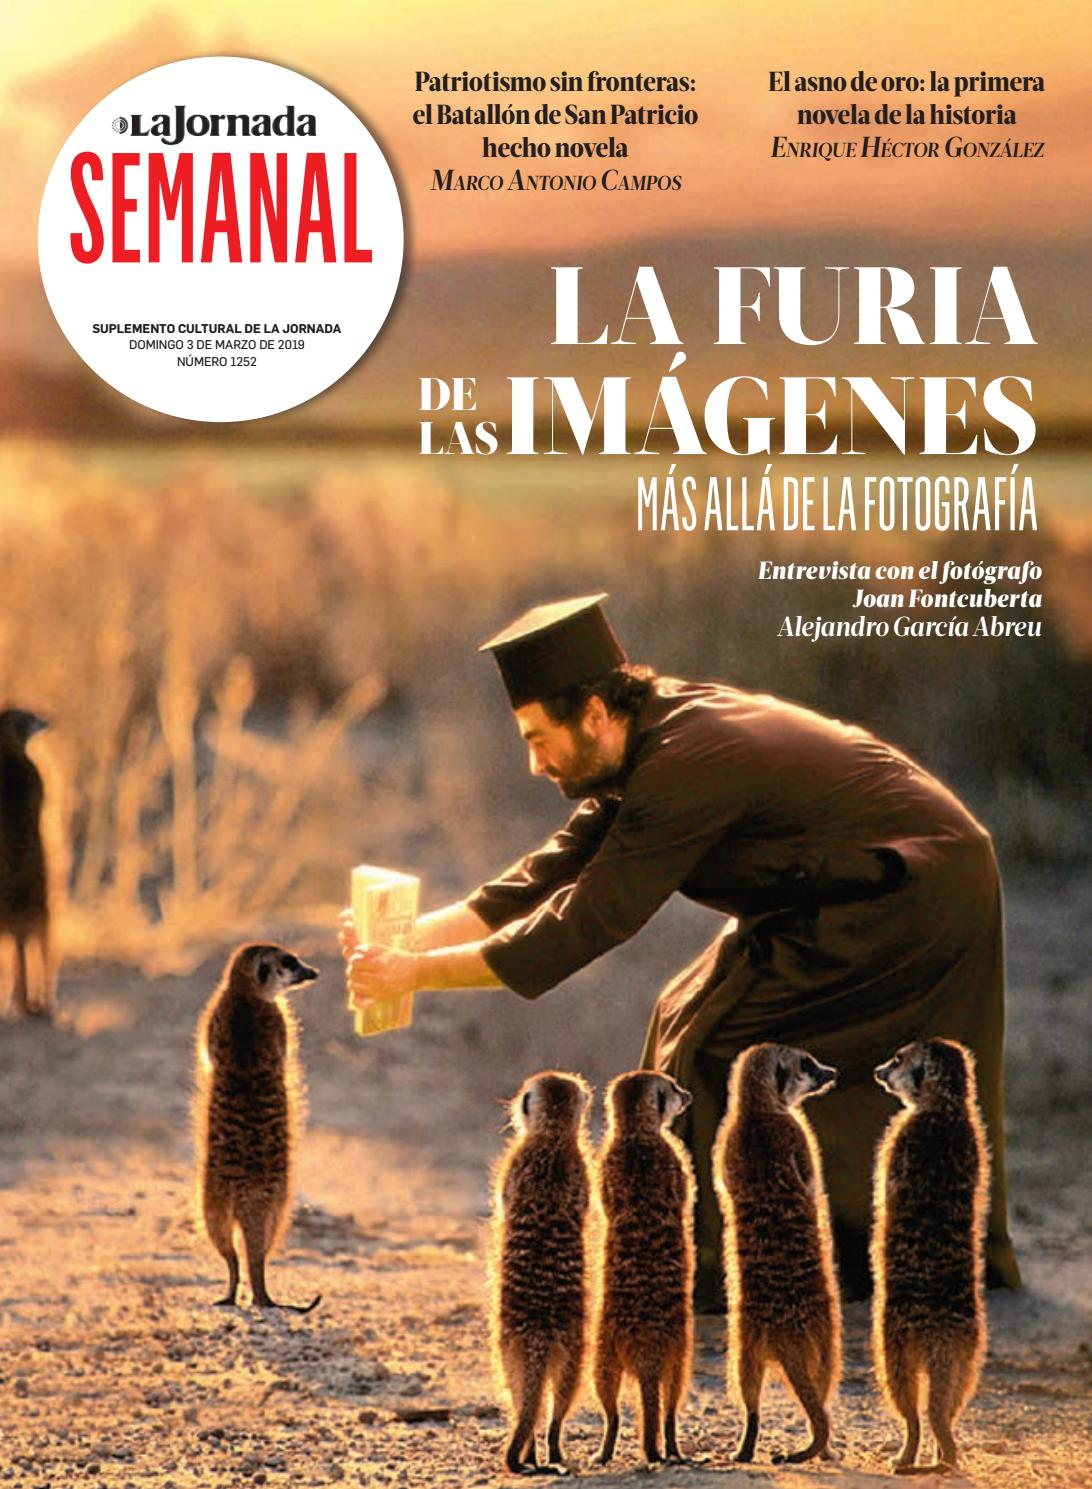 Suplemento Semanal by La Jornada - issuu